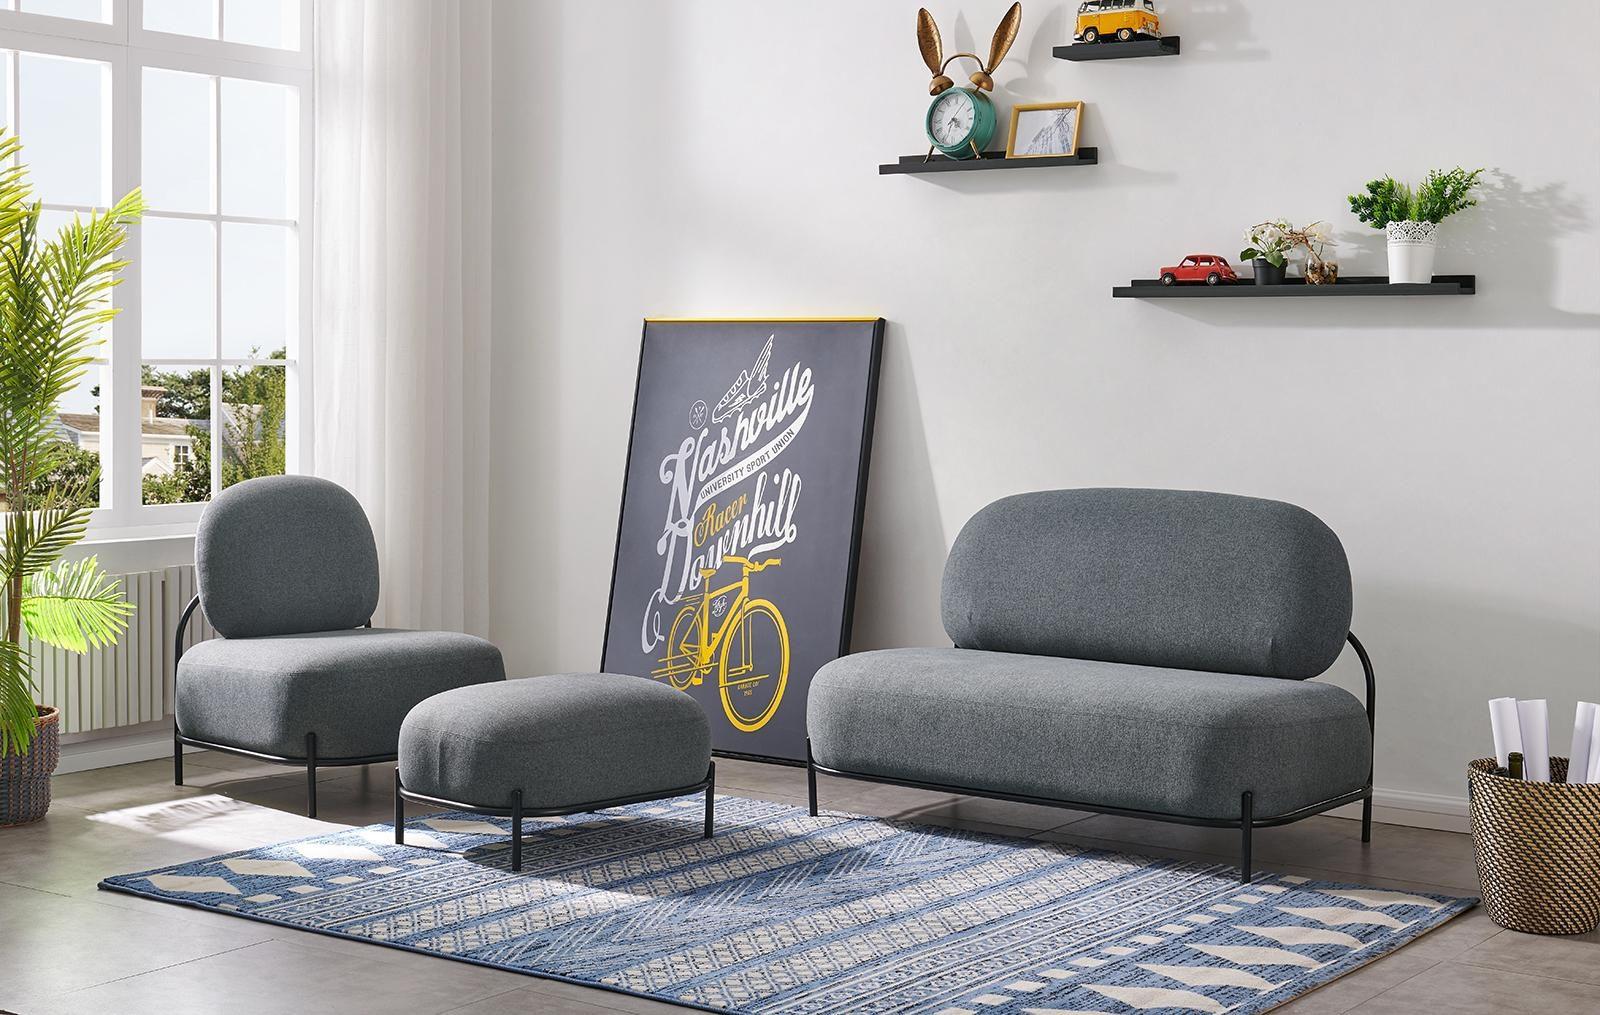 Диван ESF SOFA 06-02 (2-х местный) серый, кресло ESF SOFA 06-01 серый и пуф SOFA-06-0T серый